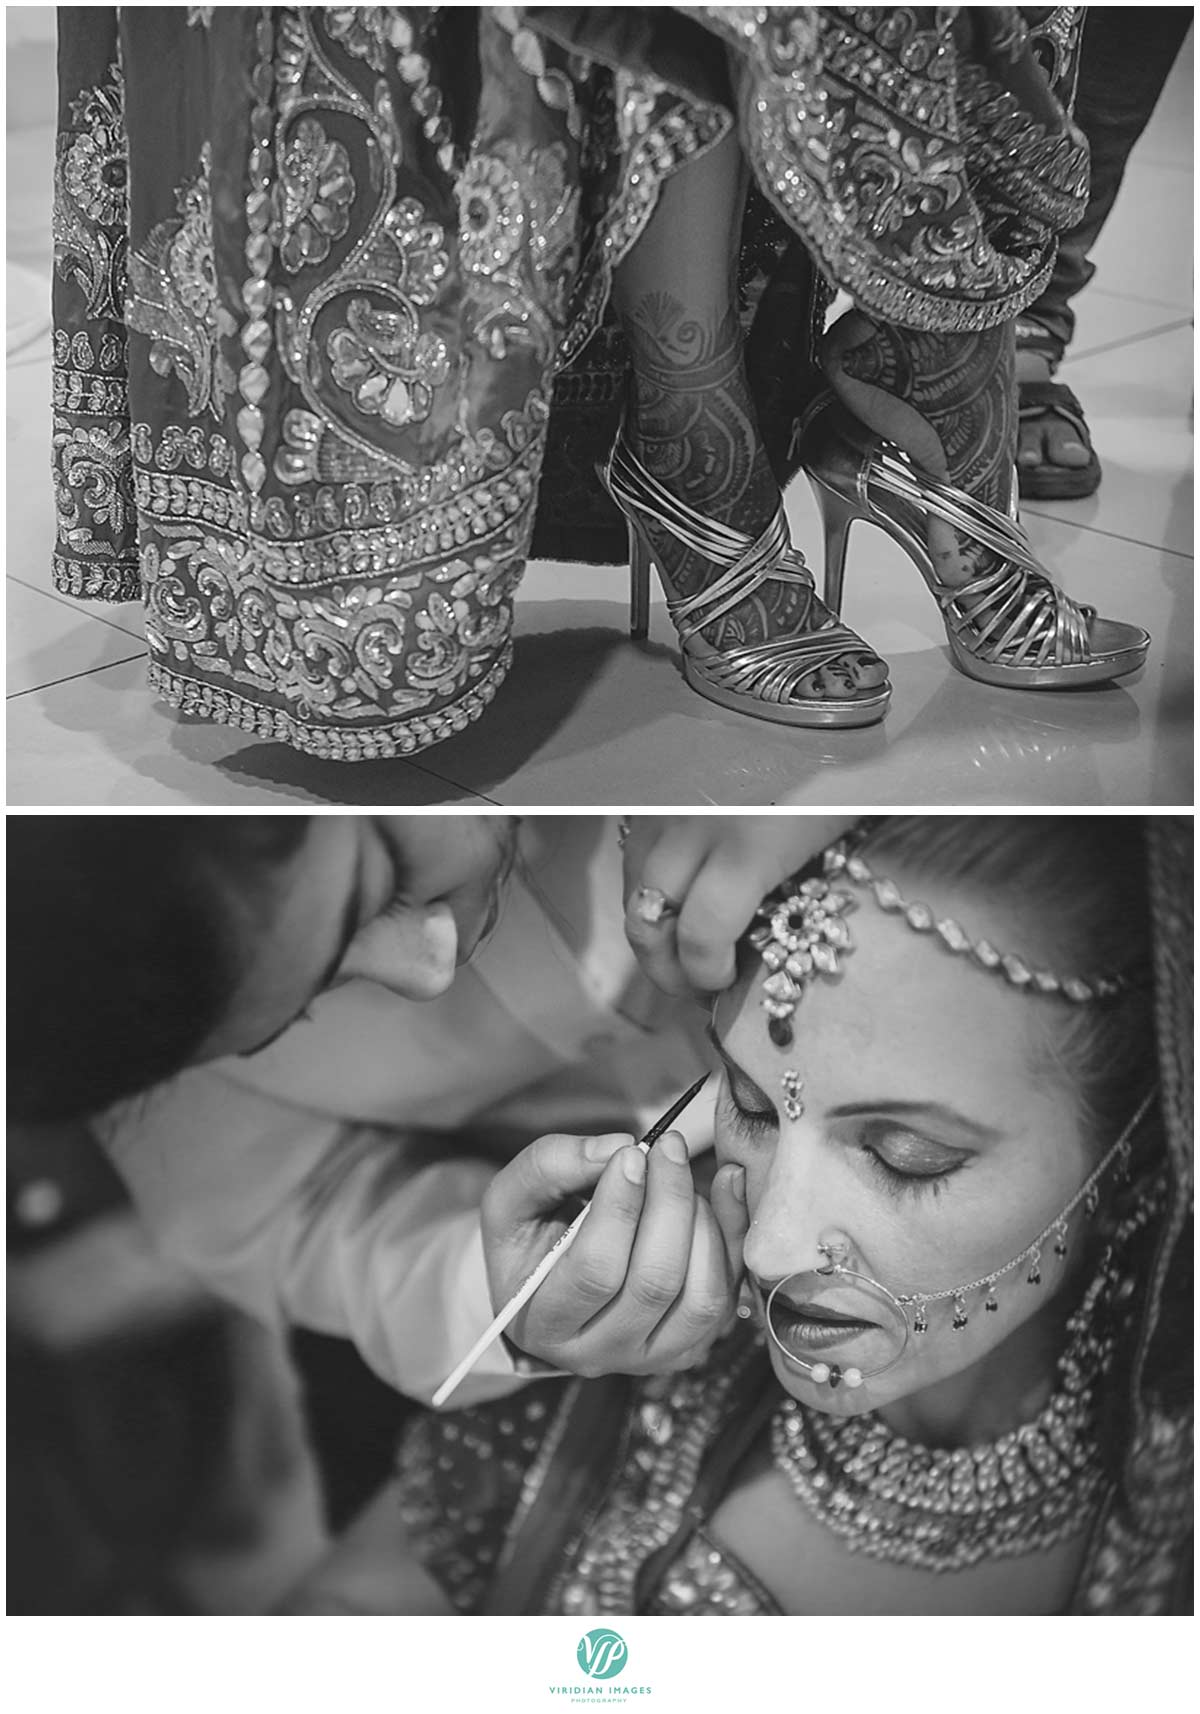 India_Chandigarh_Wedding_Viridian_Images_Photography_poto_5